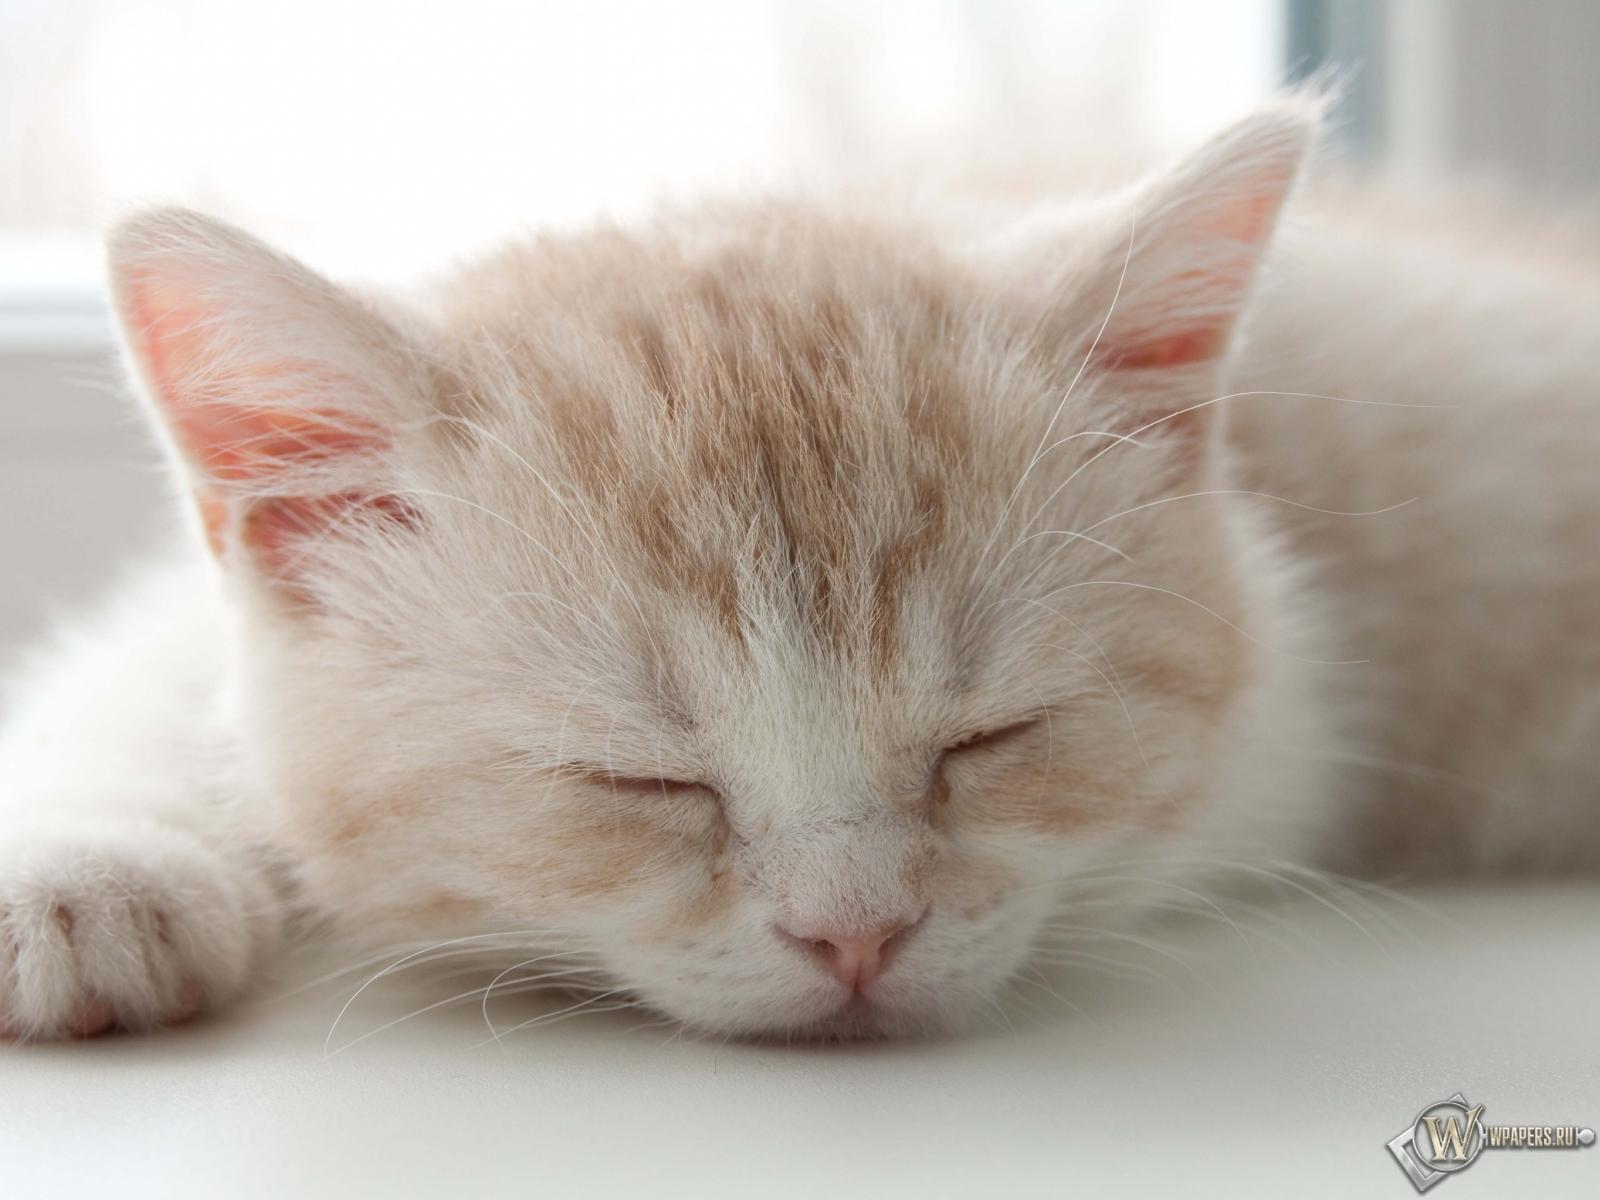 Котёнок спит 1600x1200